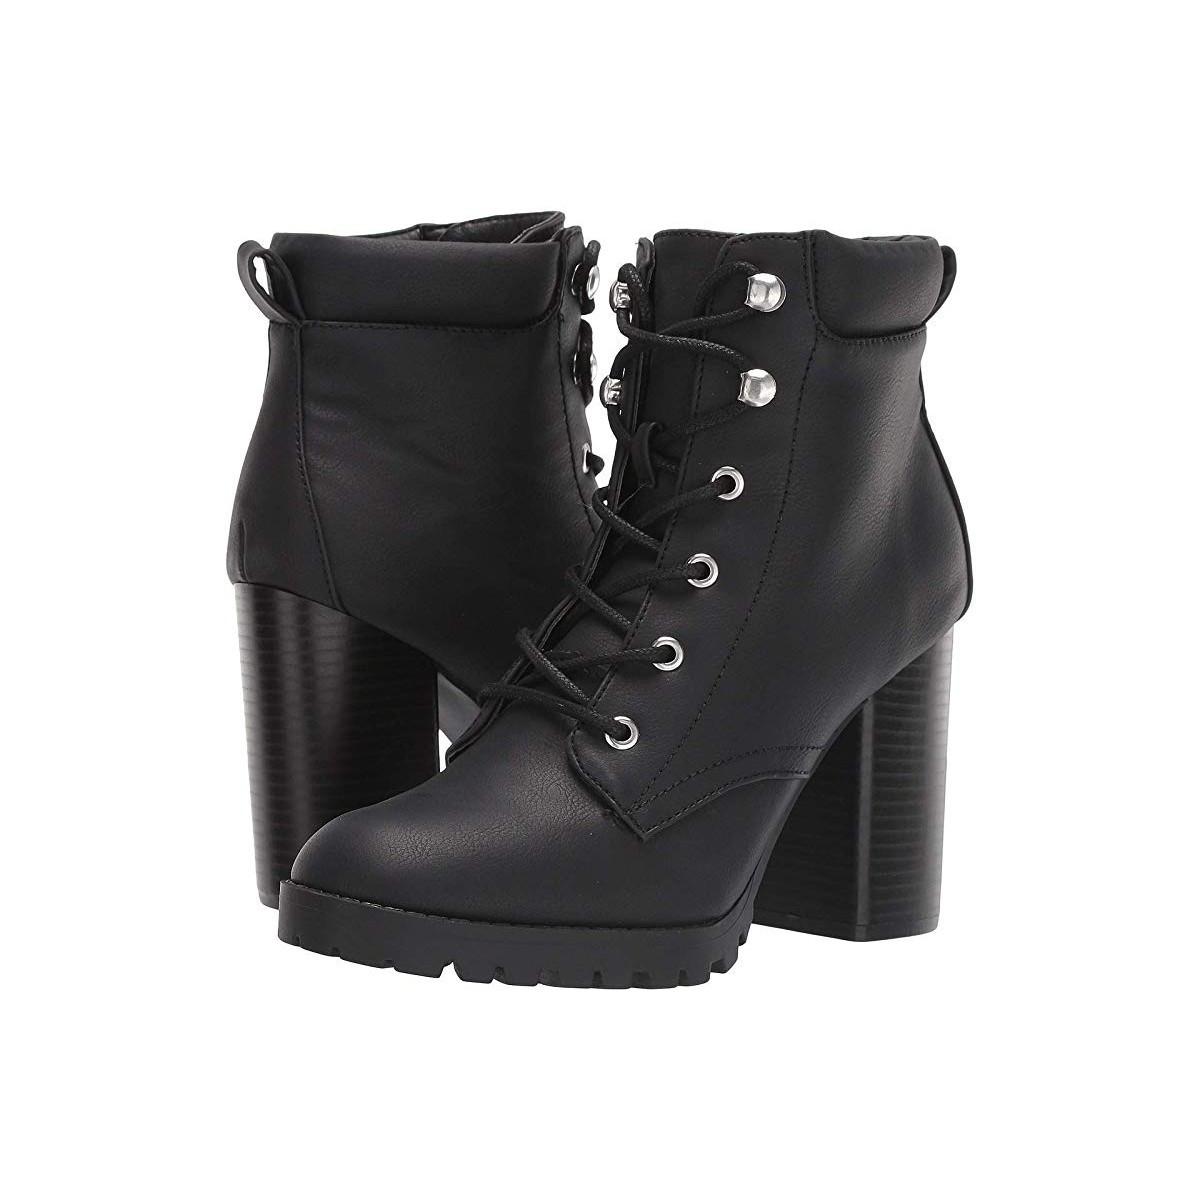 Ботинки Madden Girl Leonn Black - Оригинал, фото 1